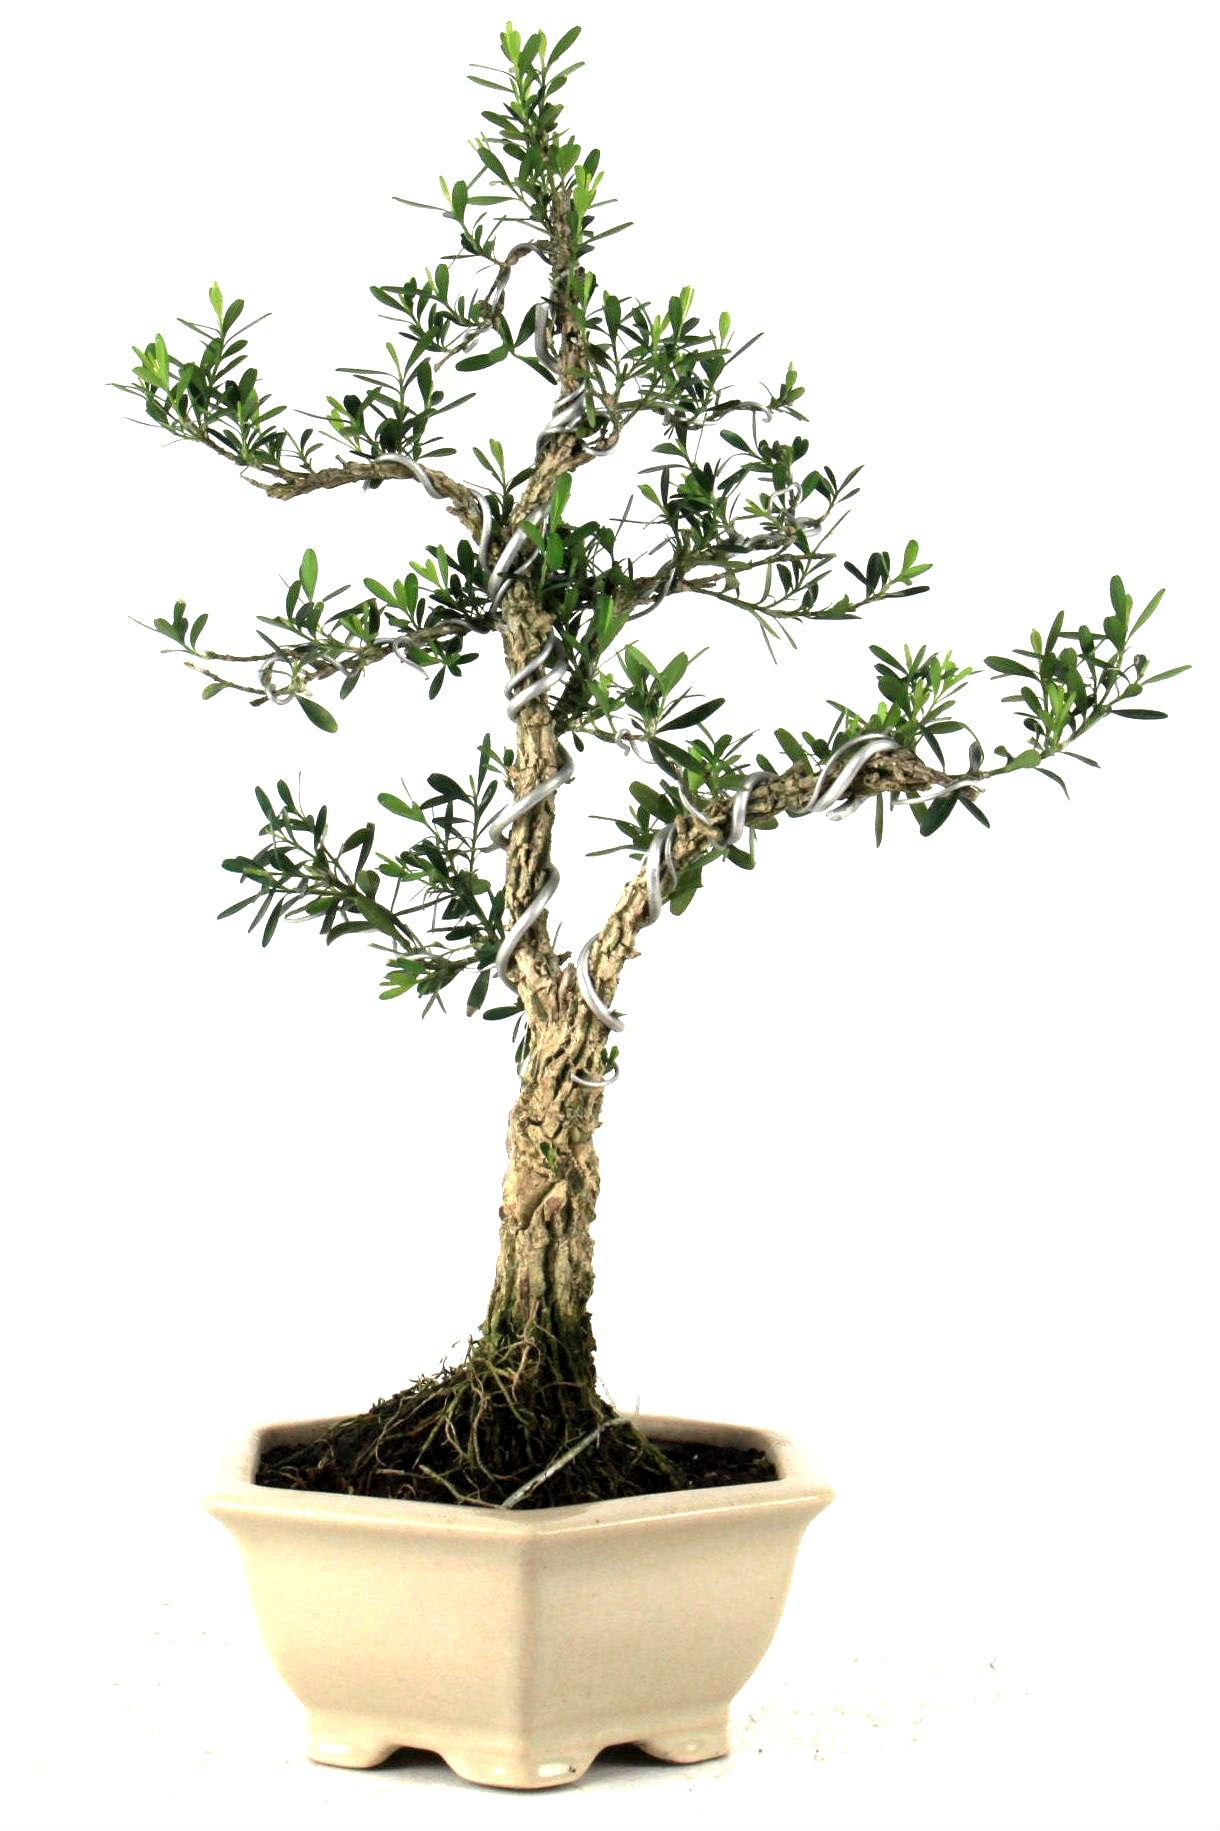 harland buxbaum 37 cm 7 bei oyaki bonsai kaufen. Black Bedroom Furniture Sets. Home Design Ideas